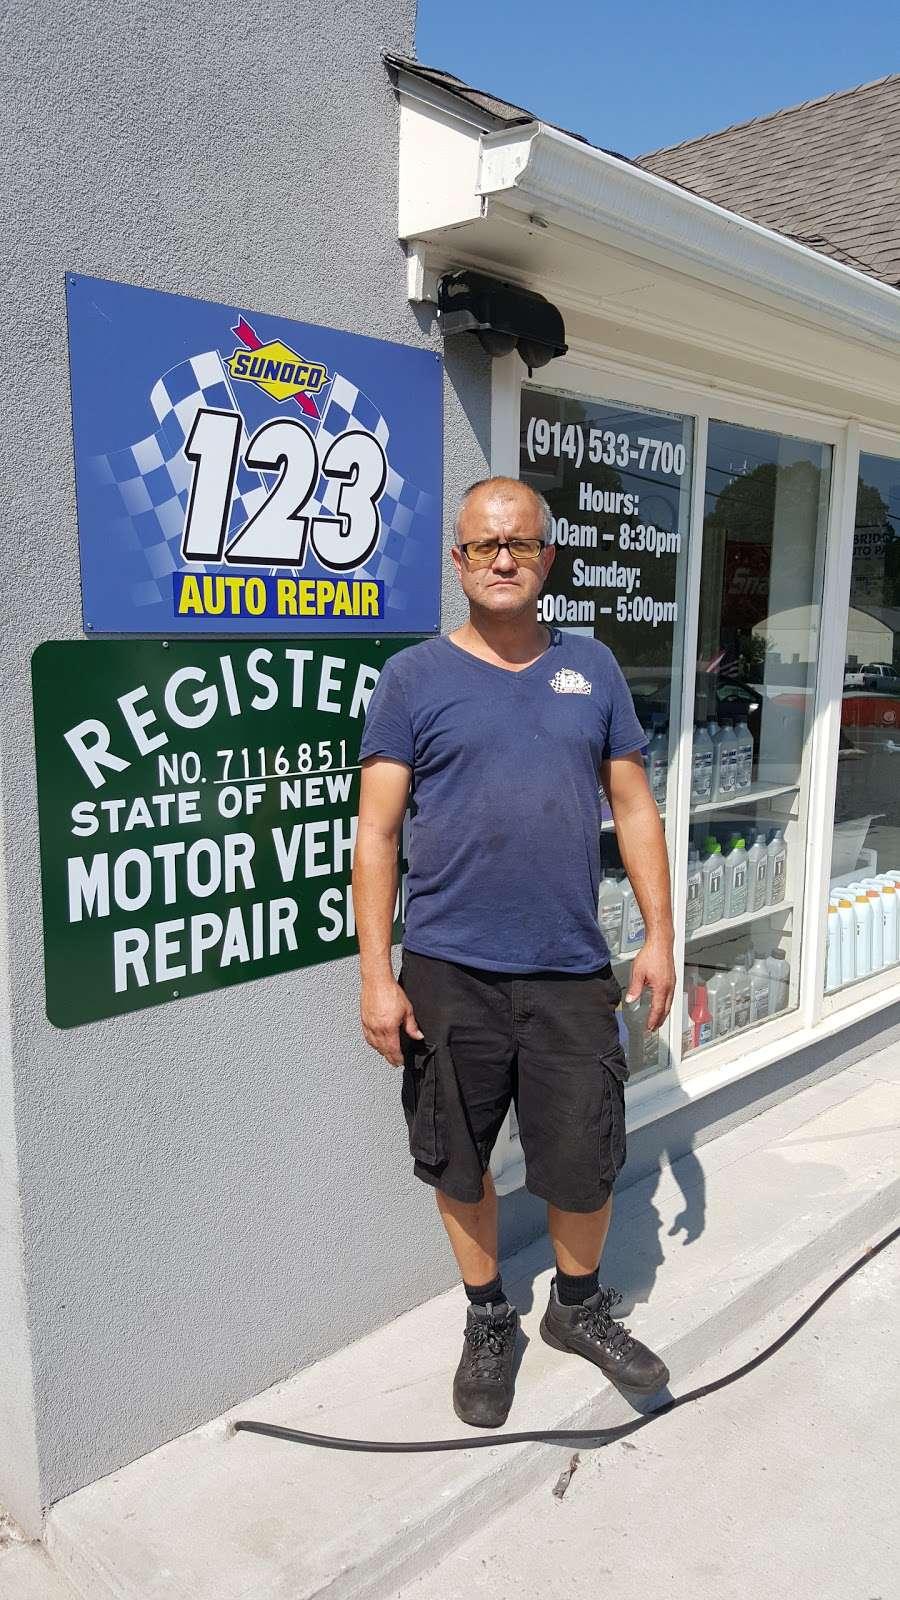 123 AUTO REPAIR INC. - car repair    Photo 10 of 10   Address: 390 Smith Ridge Rd, South Salem, NY 10590, USA   Phone: (914) 533-7700